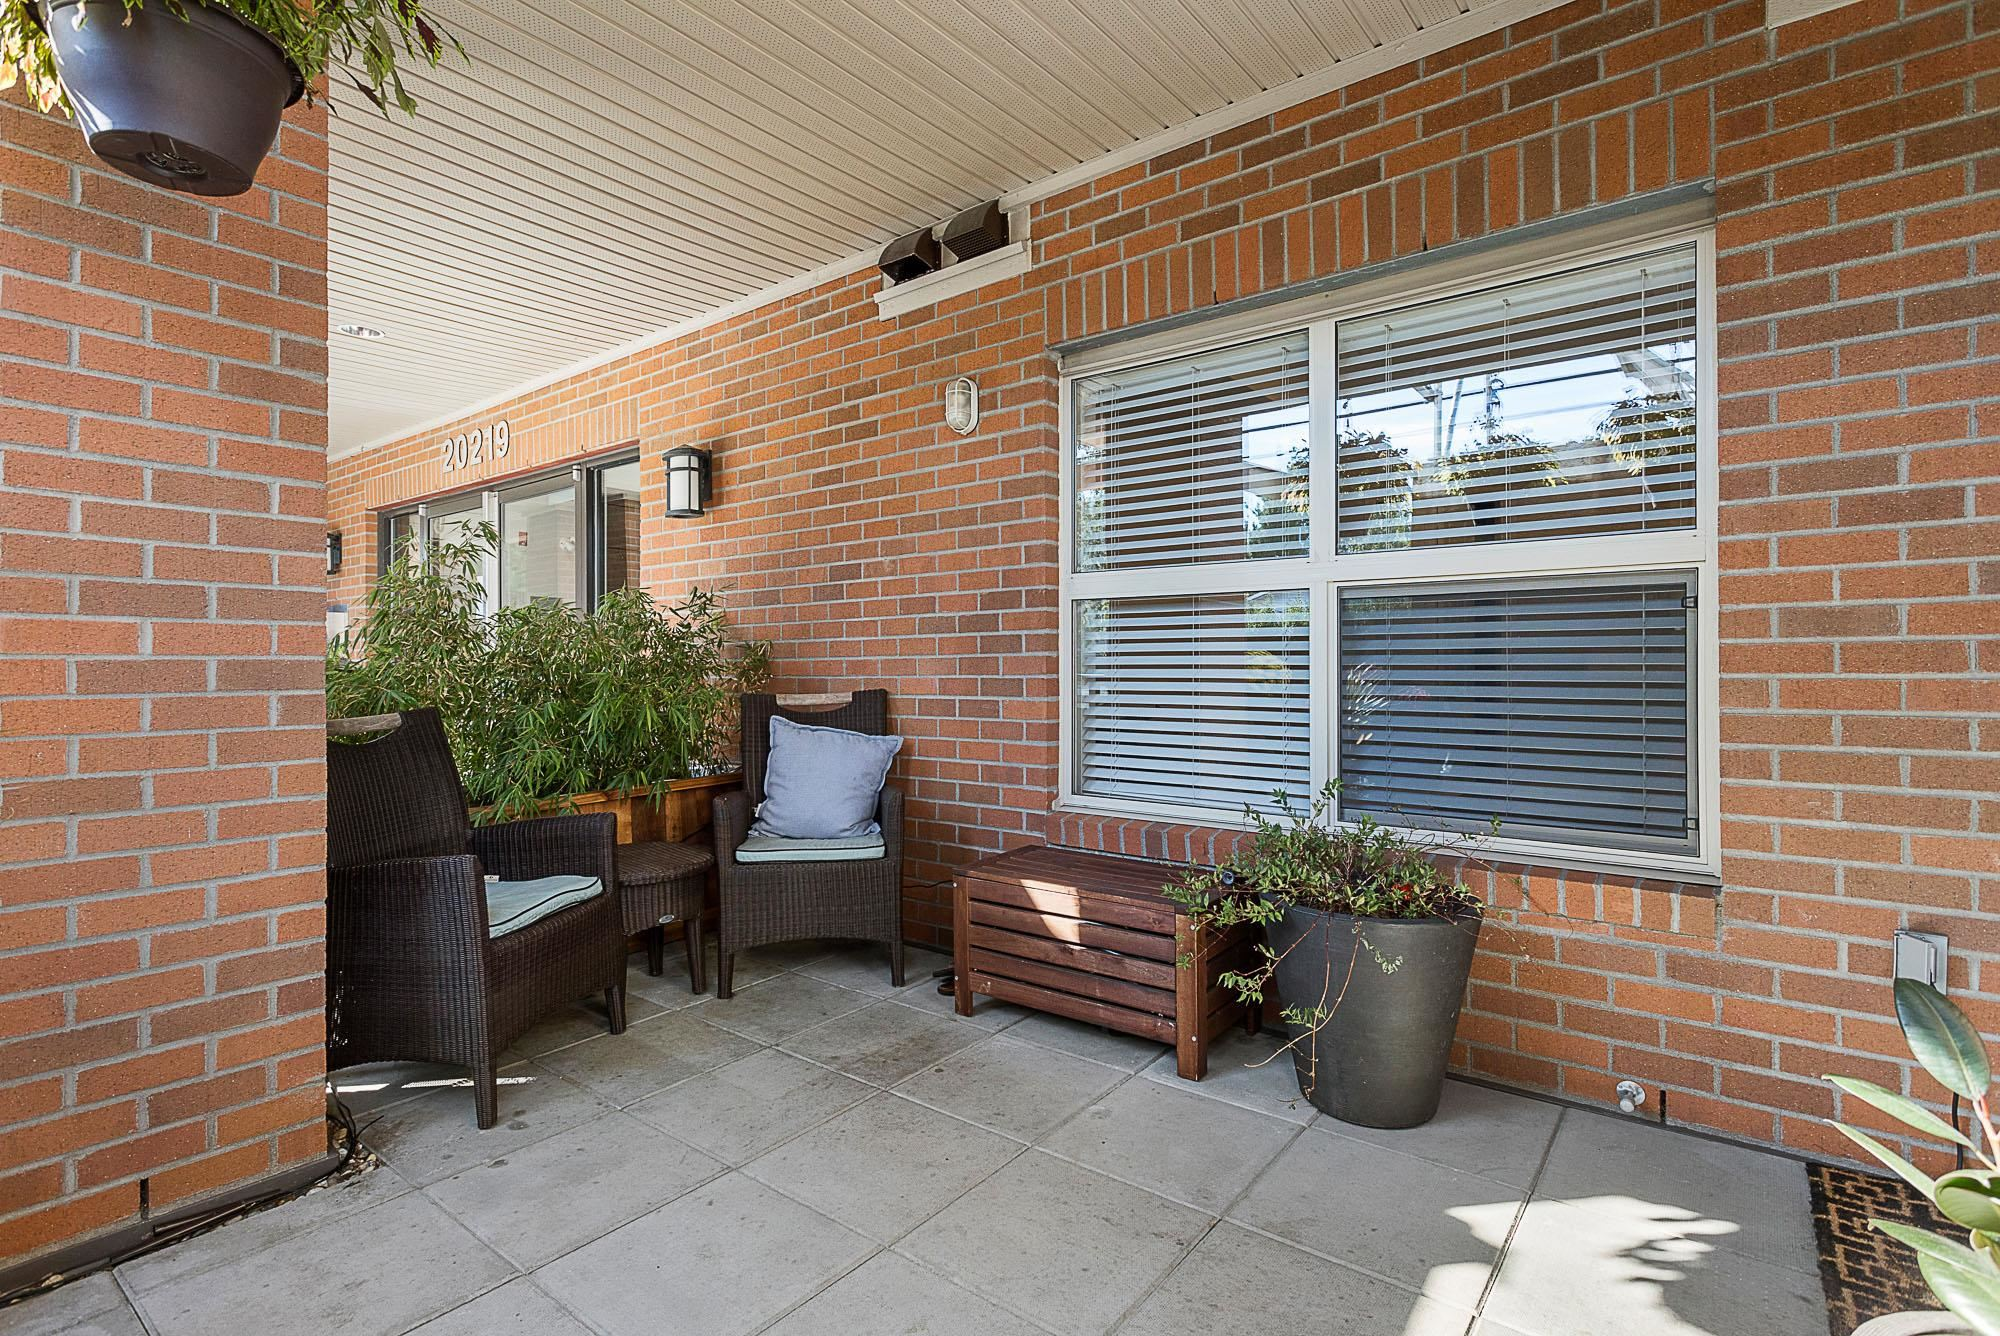 114 20219 54A AVENUE - Langley City Apartment/Condo for sale, 1 Bedroom (R2616172) - #20